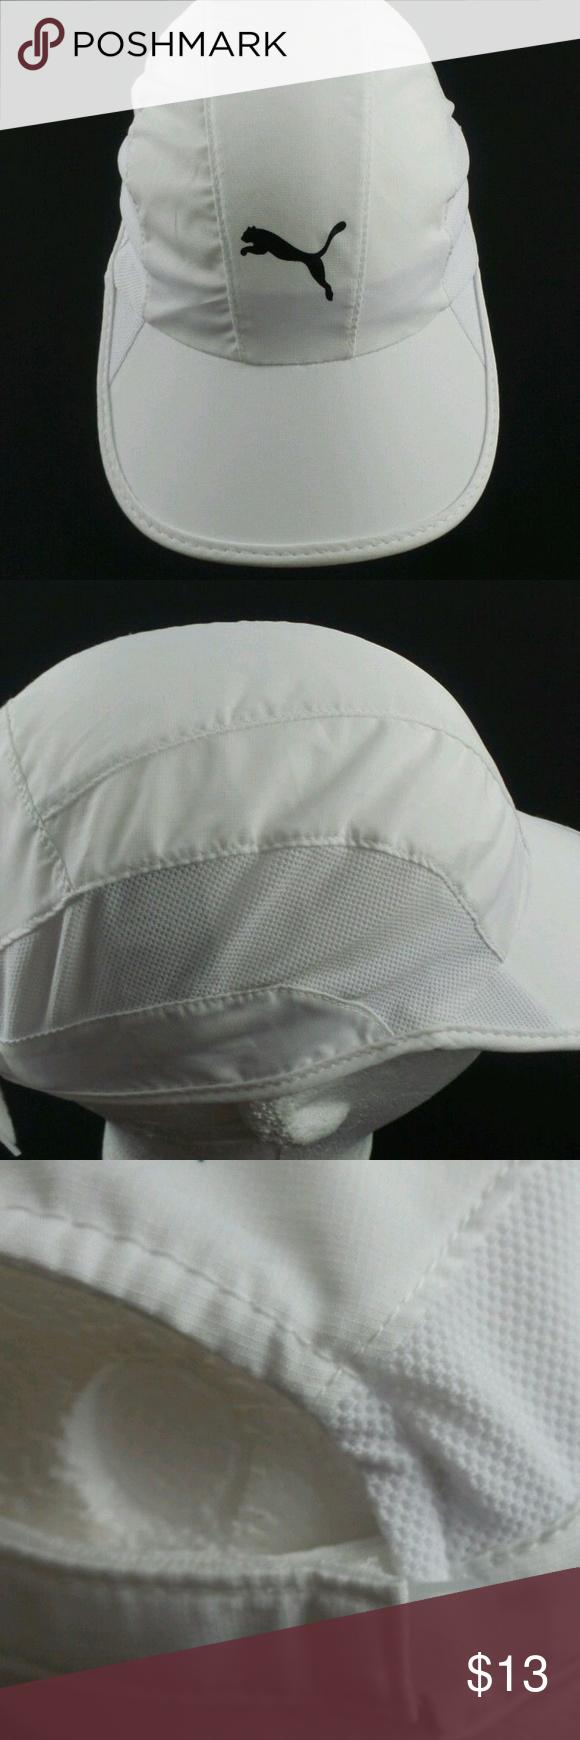 official photos 0bda7 c4f5e PUMA Lightweight Running Hat Men White Cap Basics This posting is for a PUMA  Lightweight Running